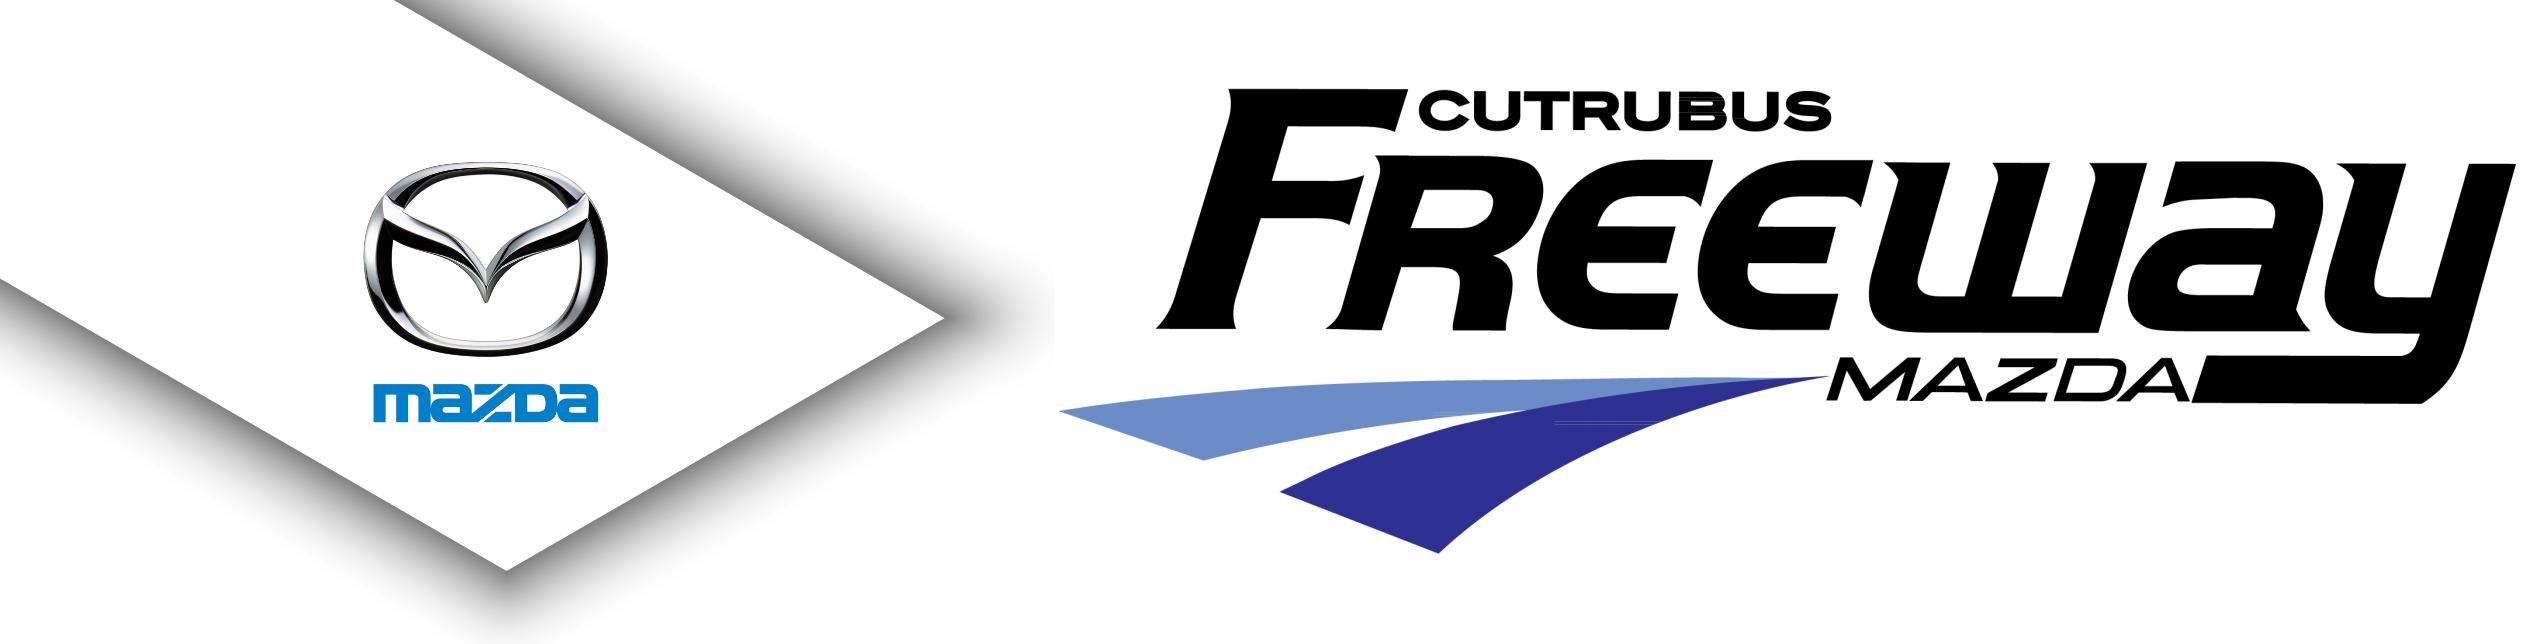 Cutrubus Freeway Mazda